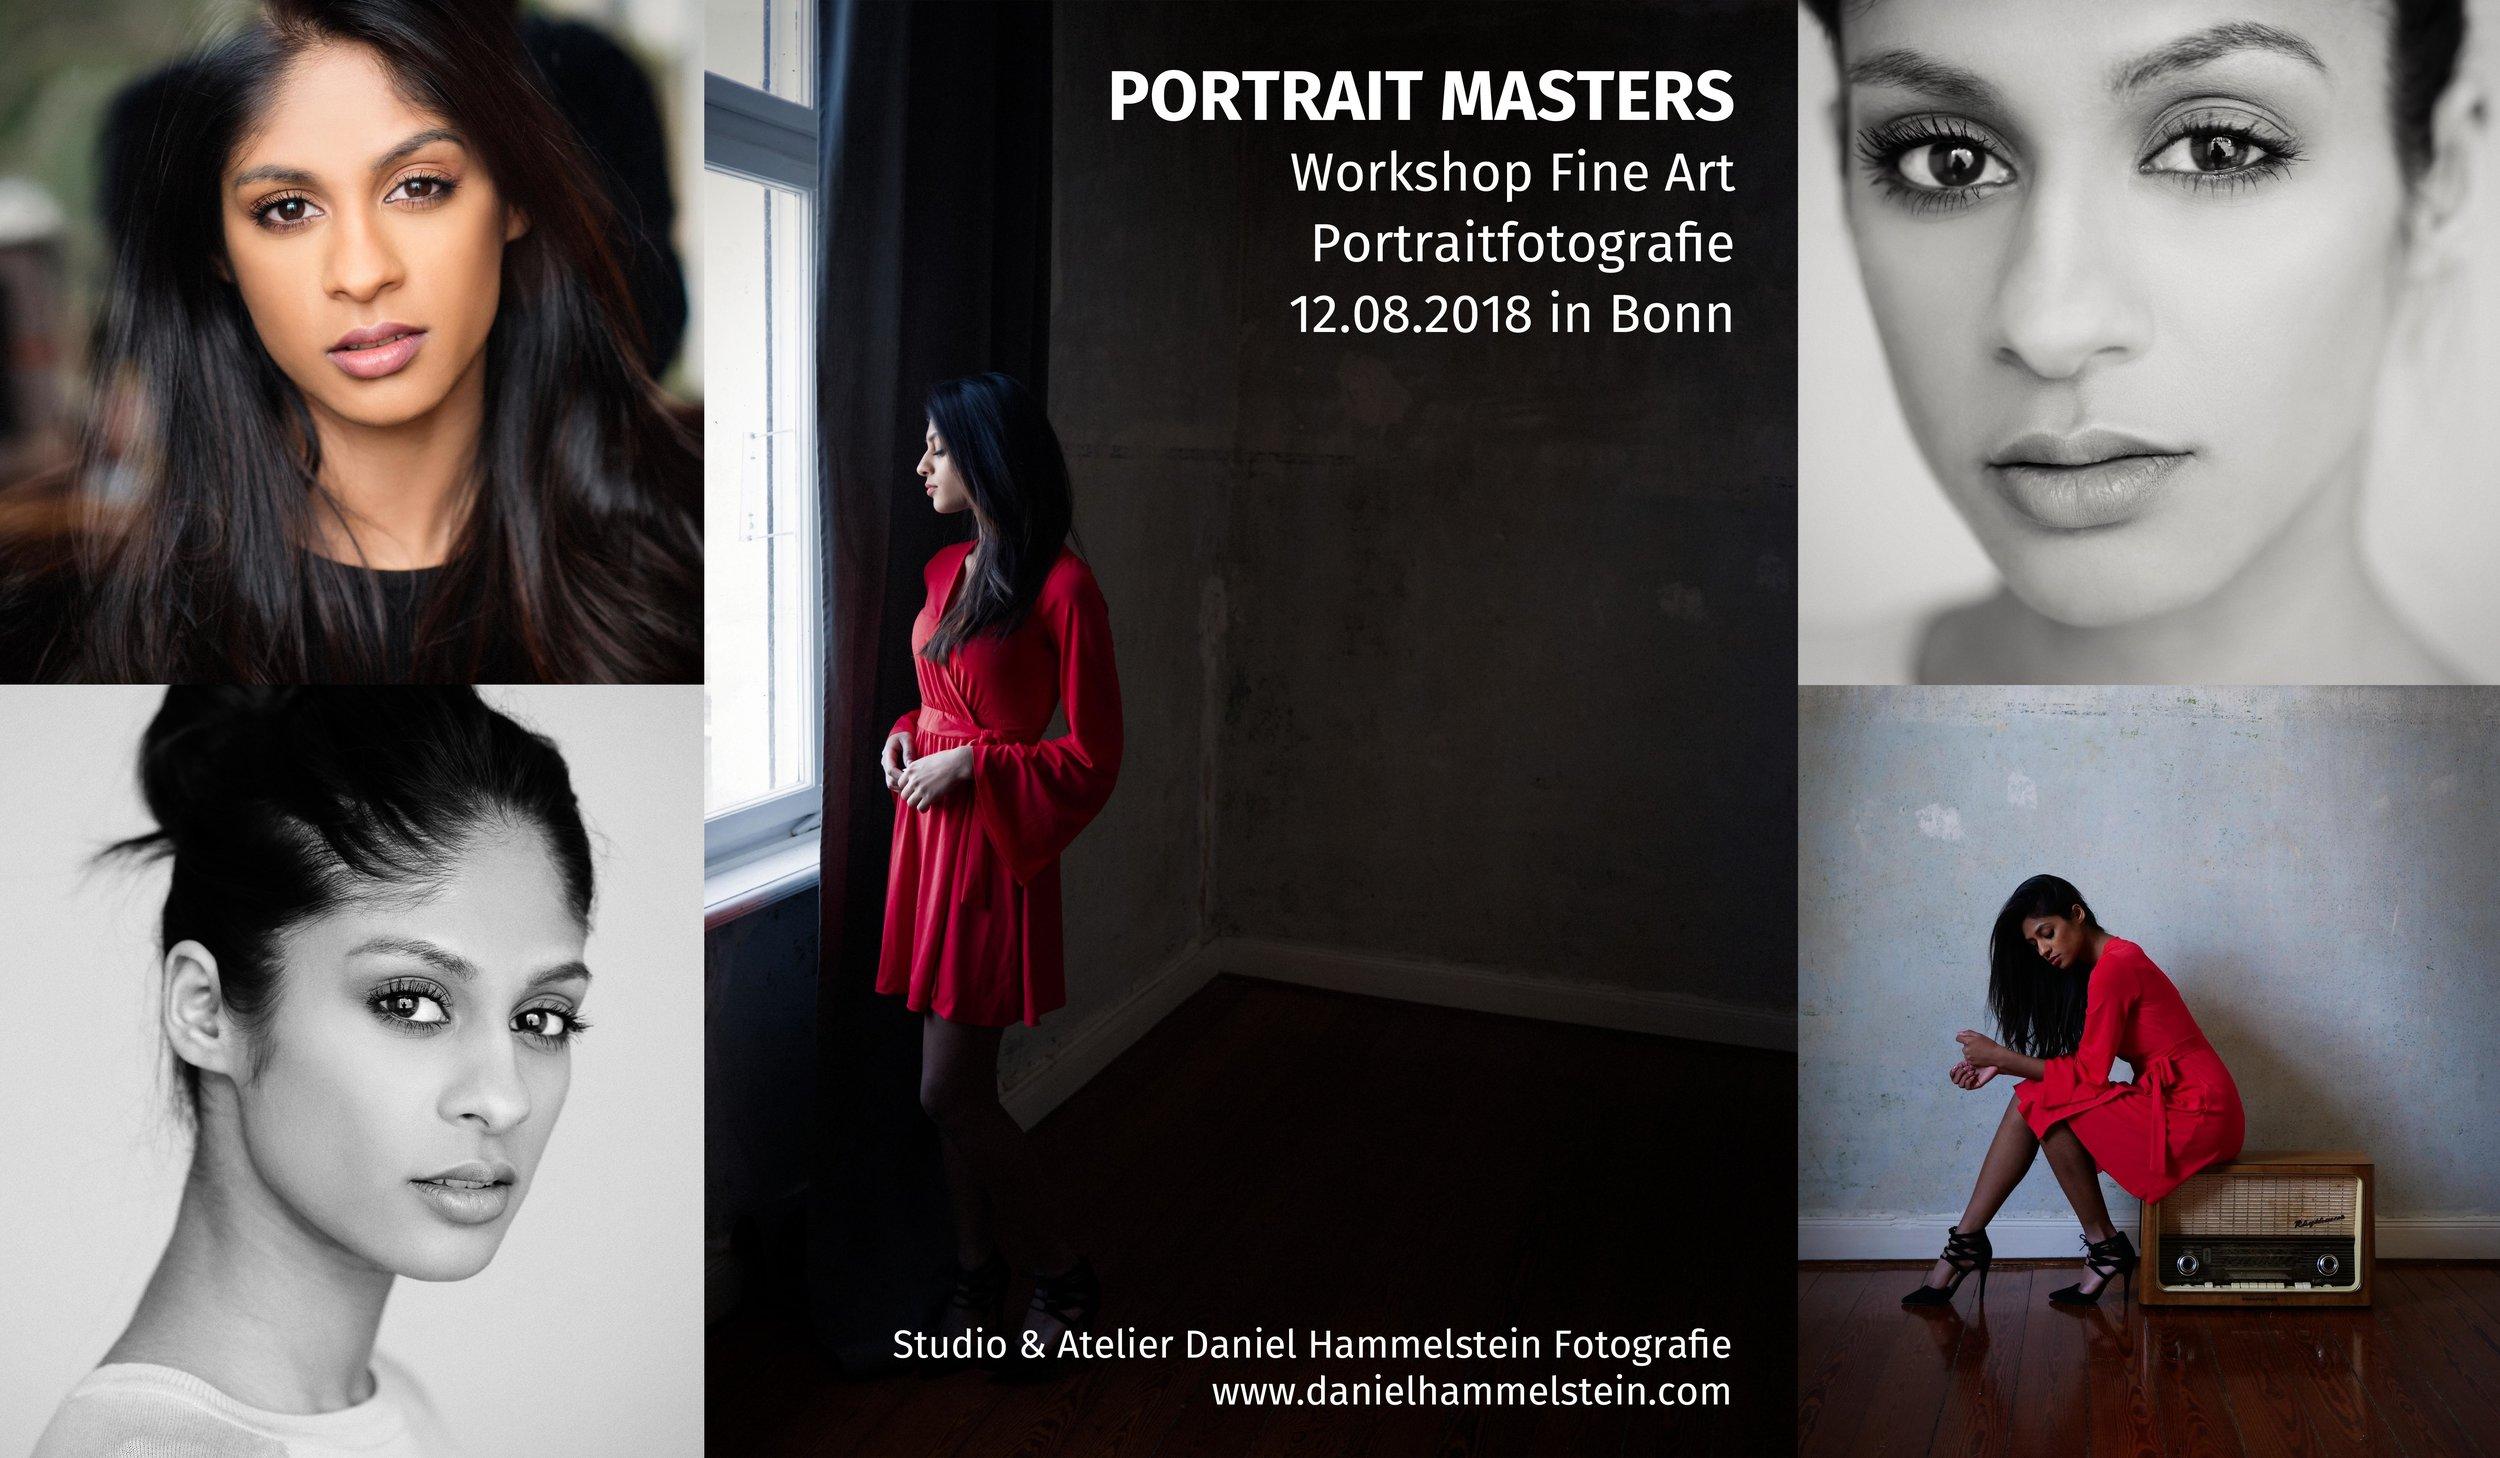 Workshop Portraitfotografie Schwarzweiß Fotoworkshop Fotokurs Bonn Köln Düsseldorf August 2018.jpg